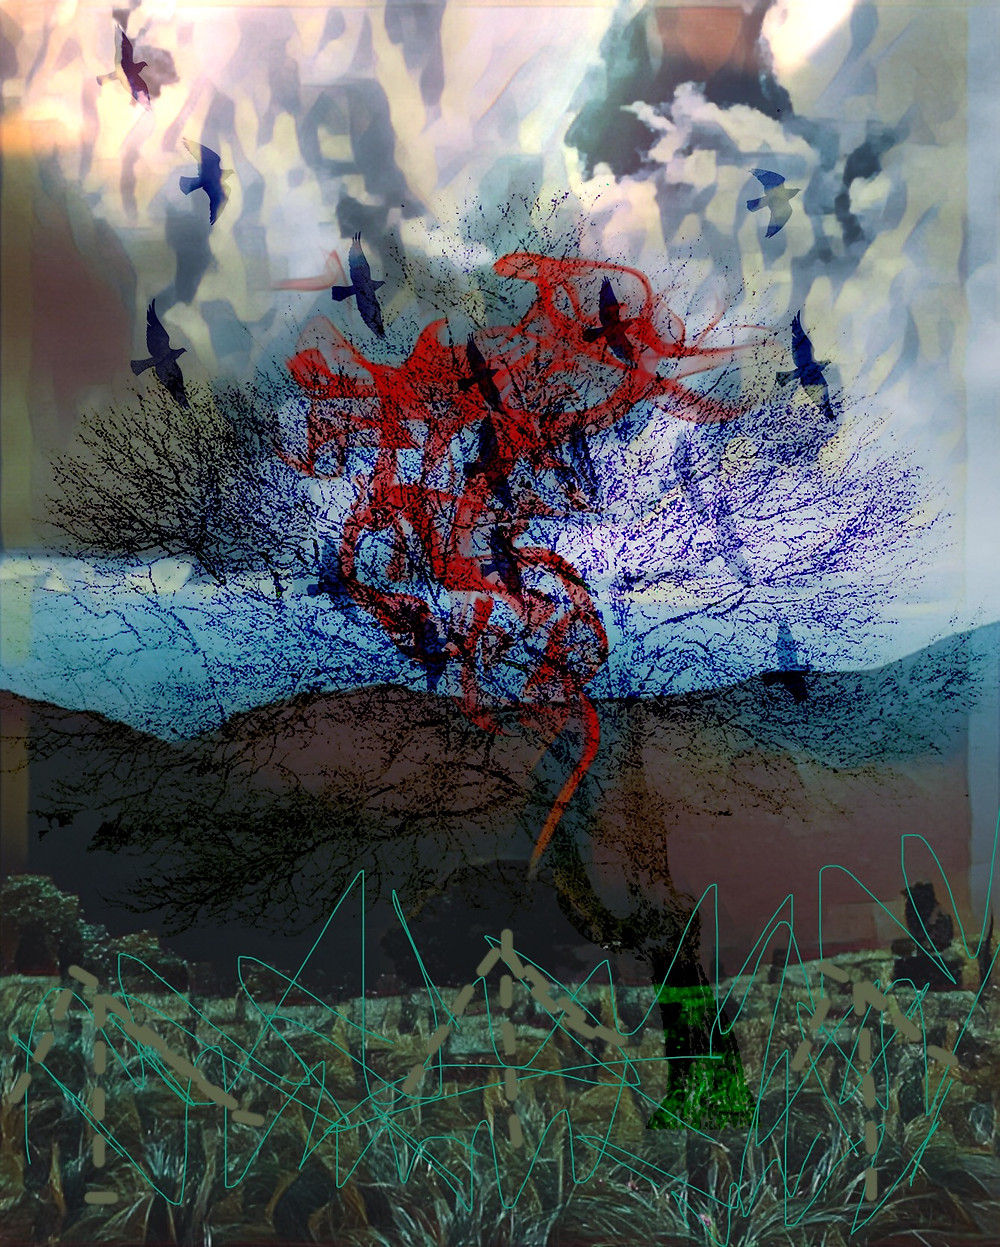 Darkness Lifting: Linsey Gessner